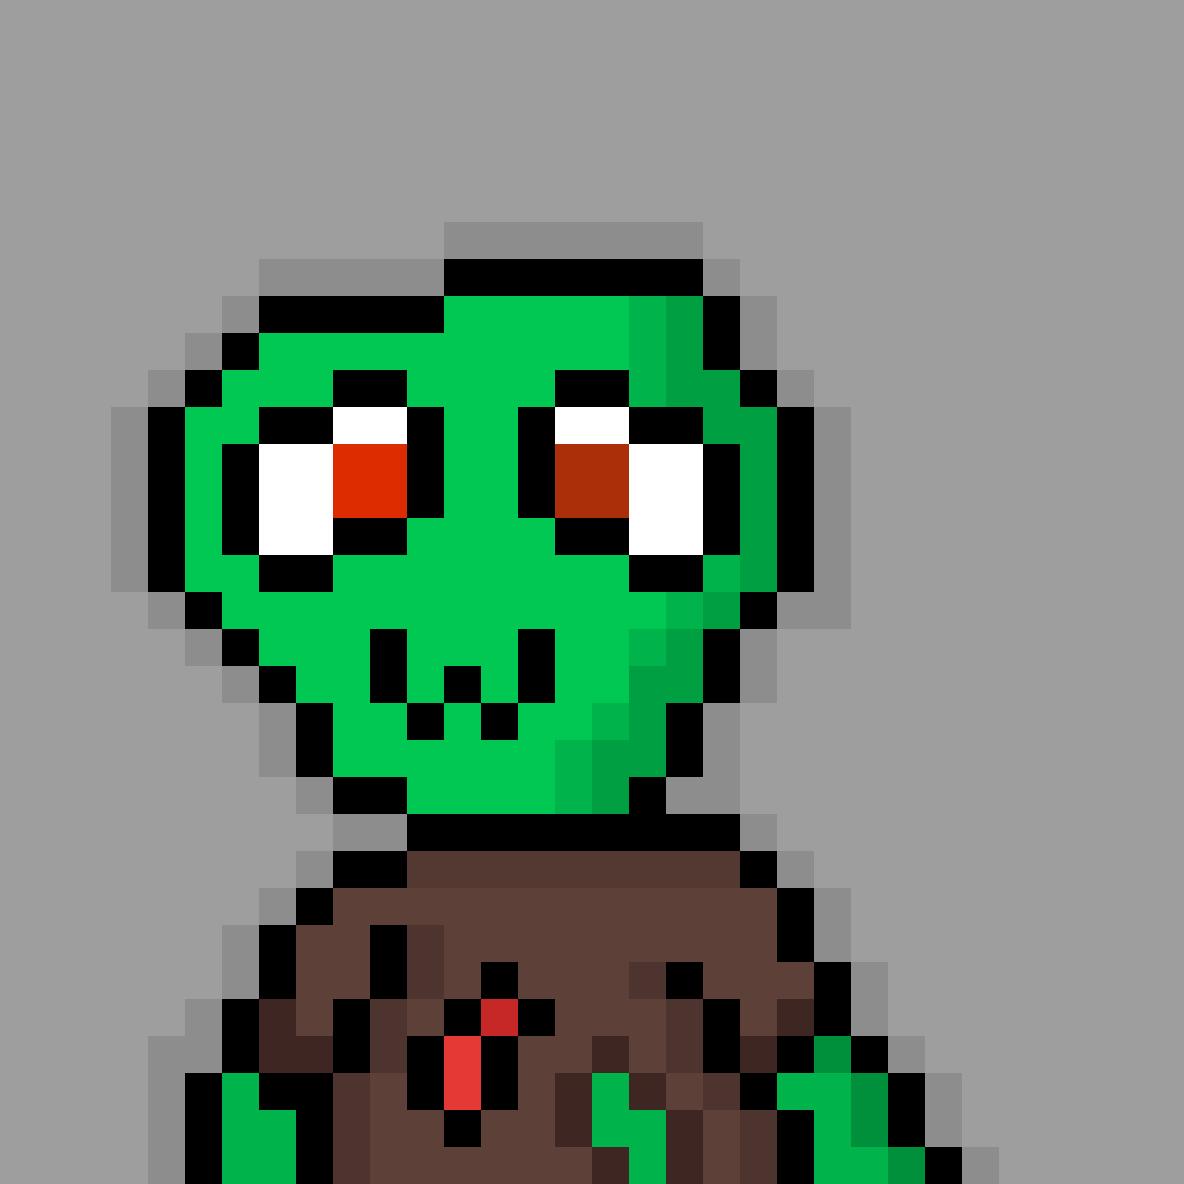 zombi by qerlx